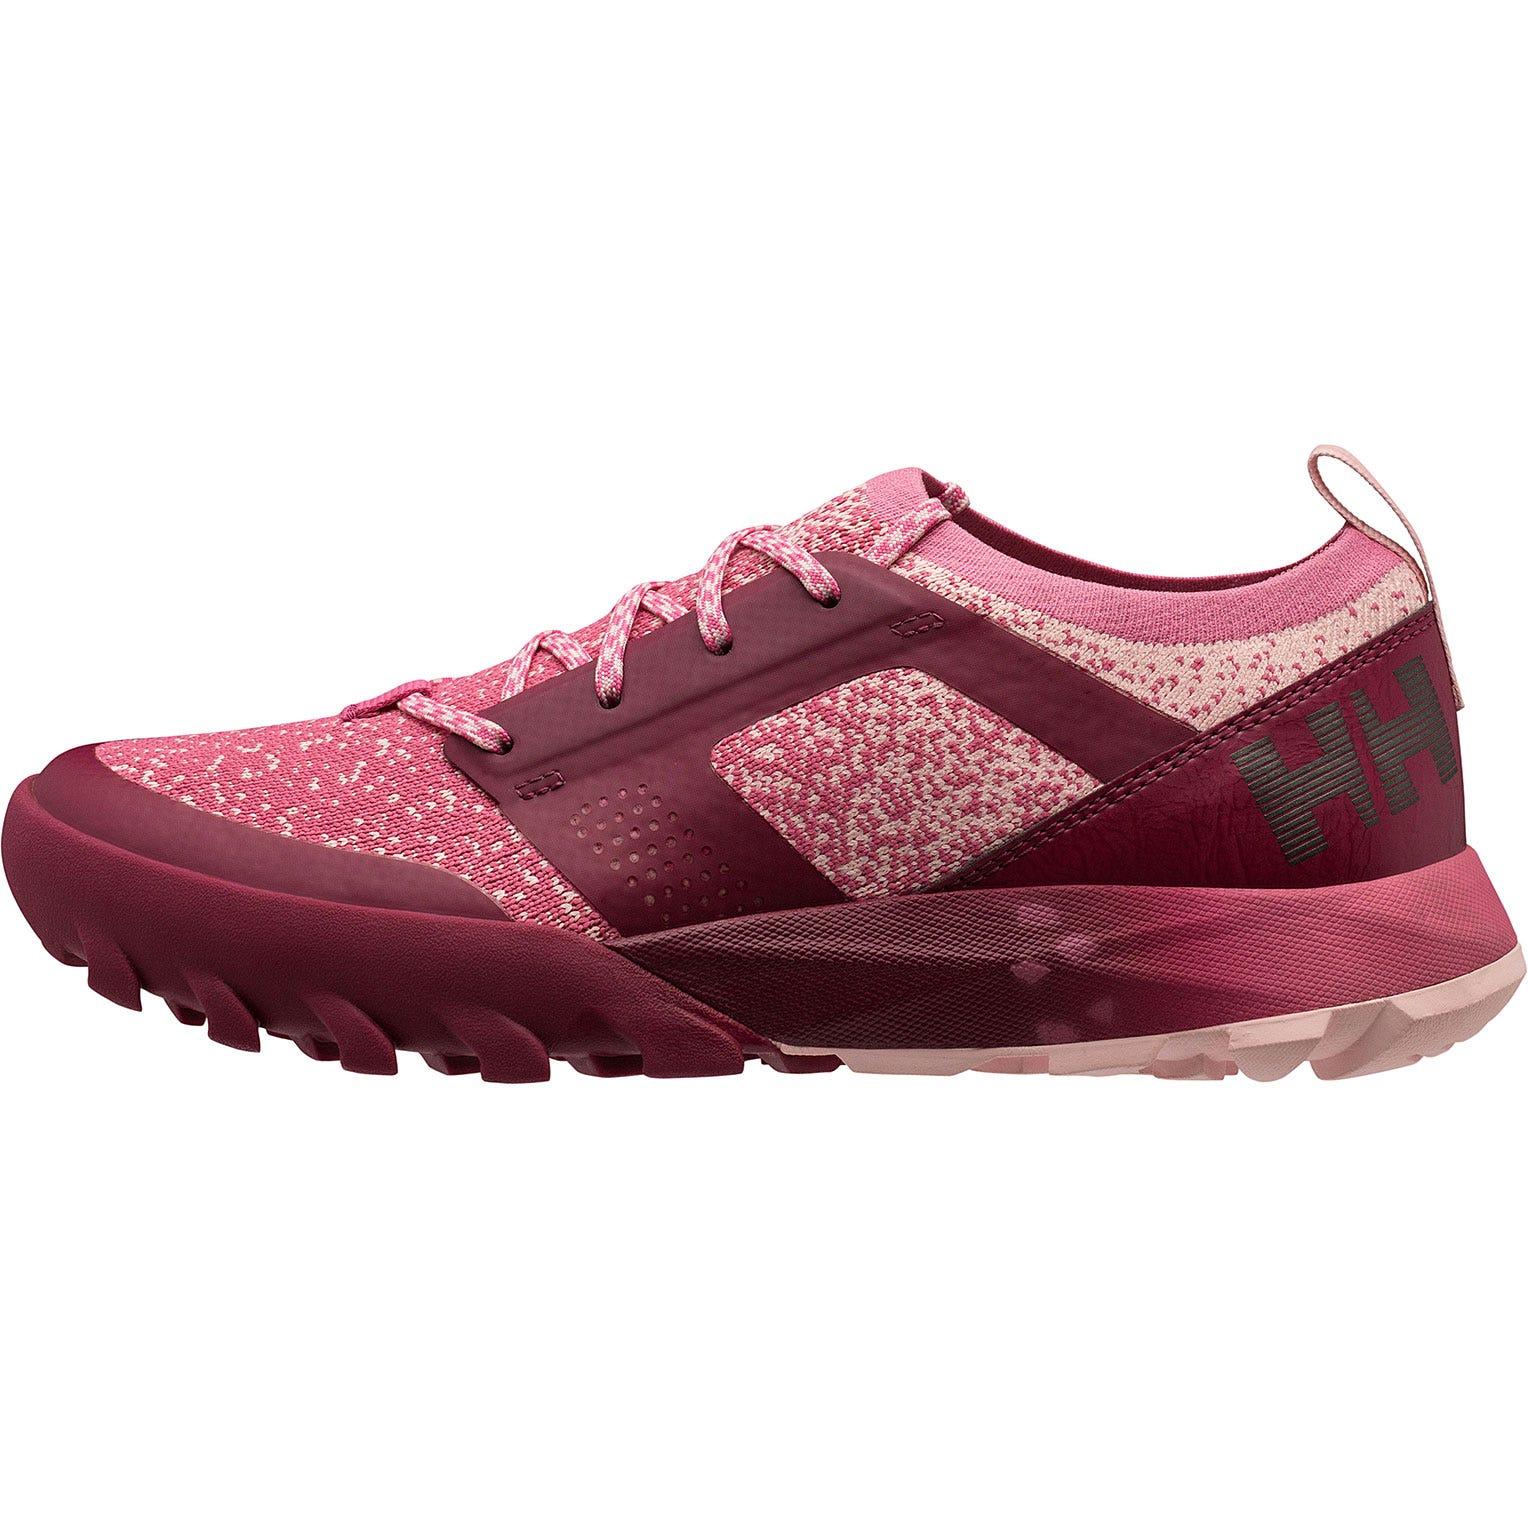 Helly Hansen W Loke Dash Womens Hiking Boot Red 39.3/8